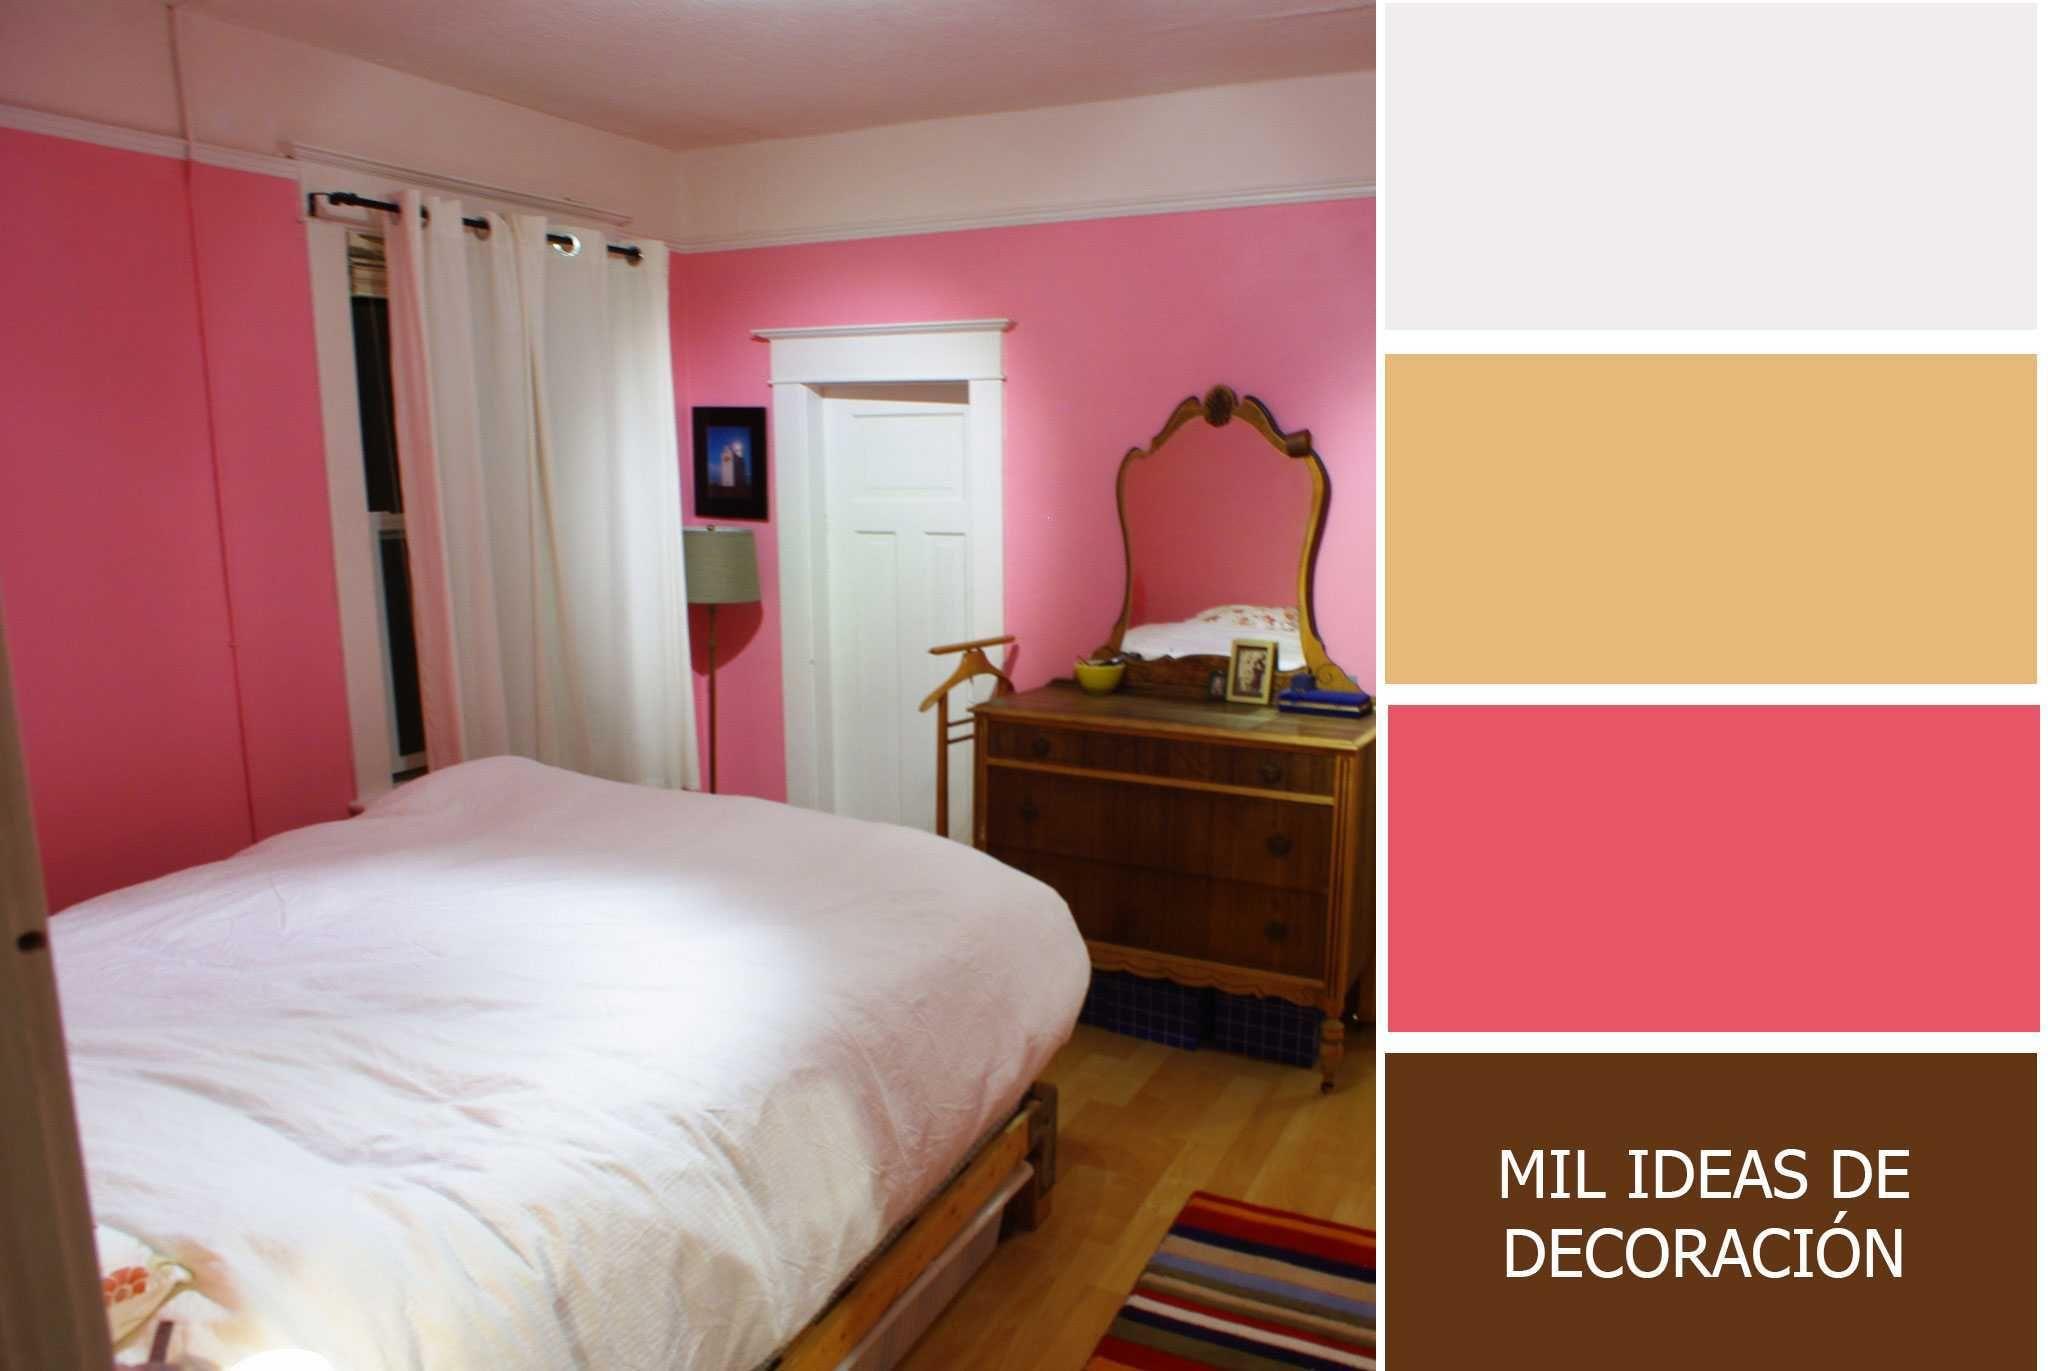 Ideas Para Pintar Paredes Paletas De Colores Para Dormitorio Colores Para Dormitorio Combinacion De Colores